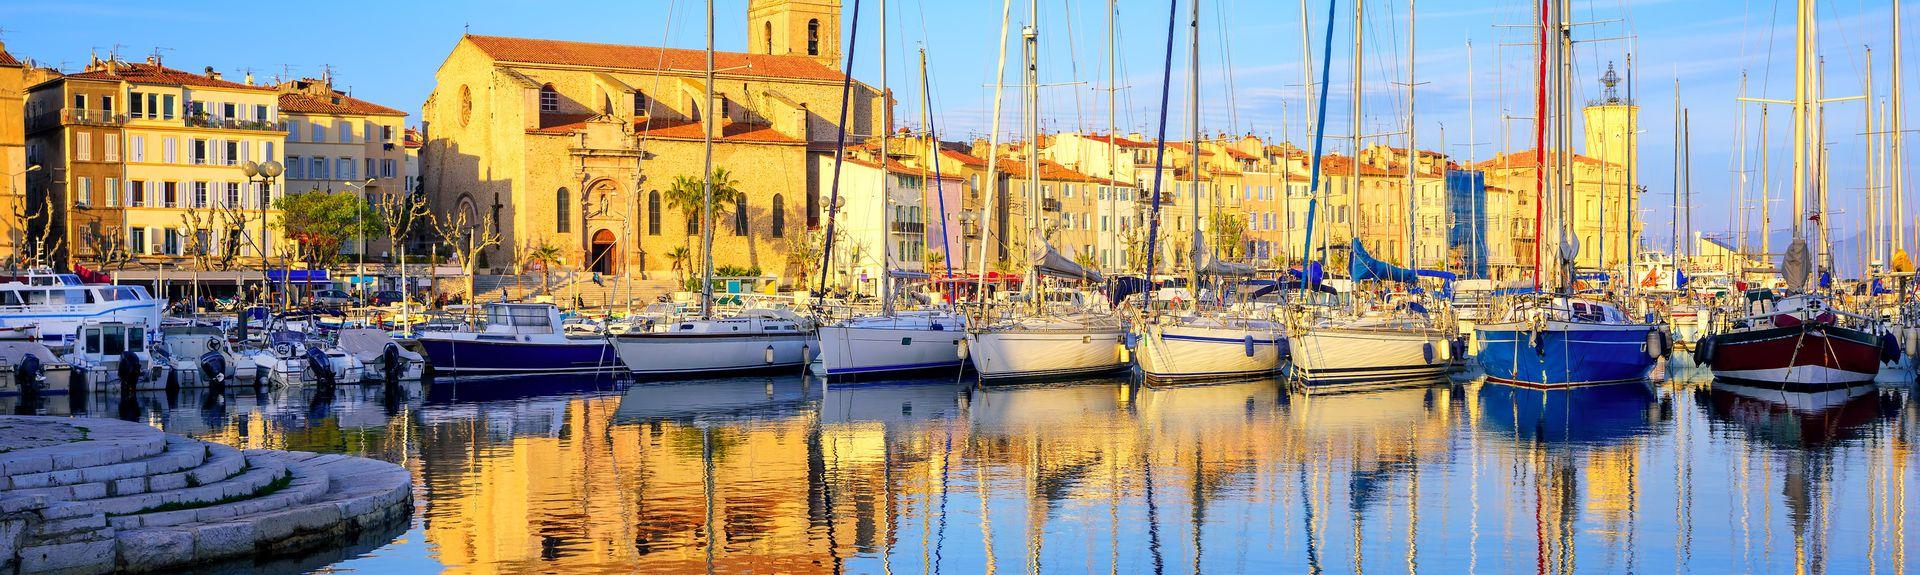 La Ciotat, Provence-Alpes-Côte d'Azur, Frankrike